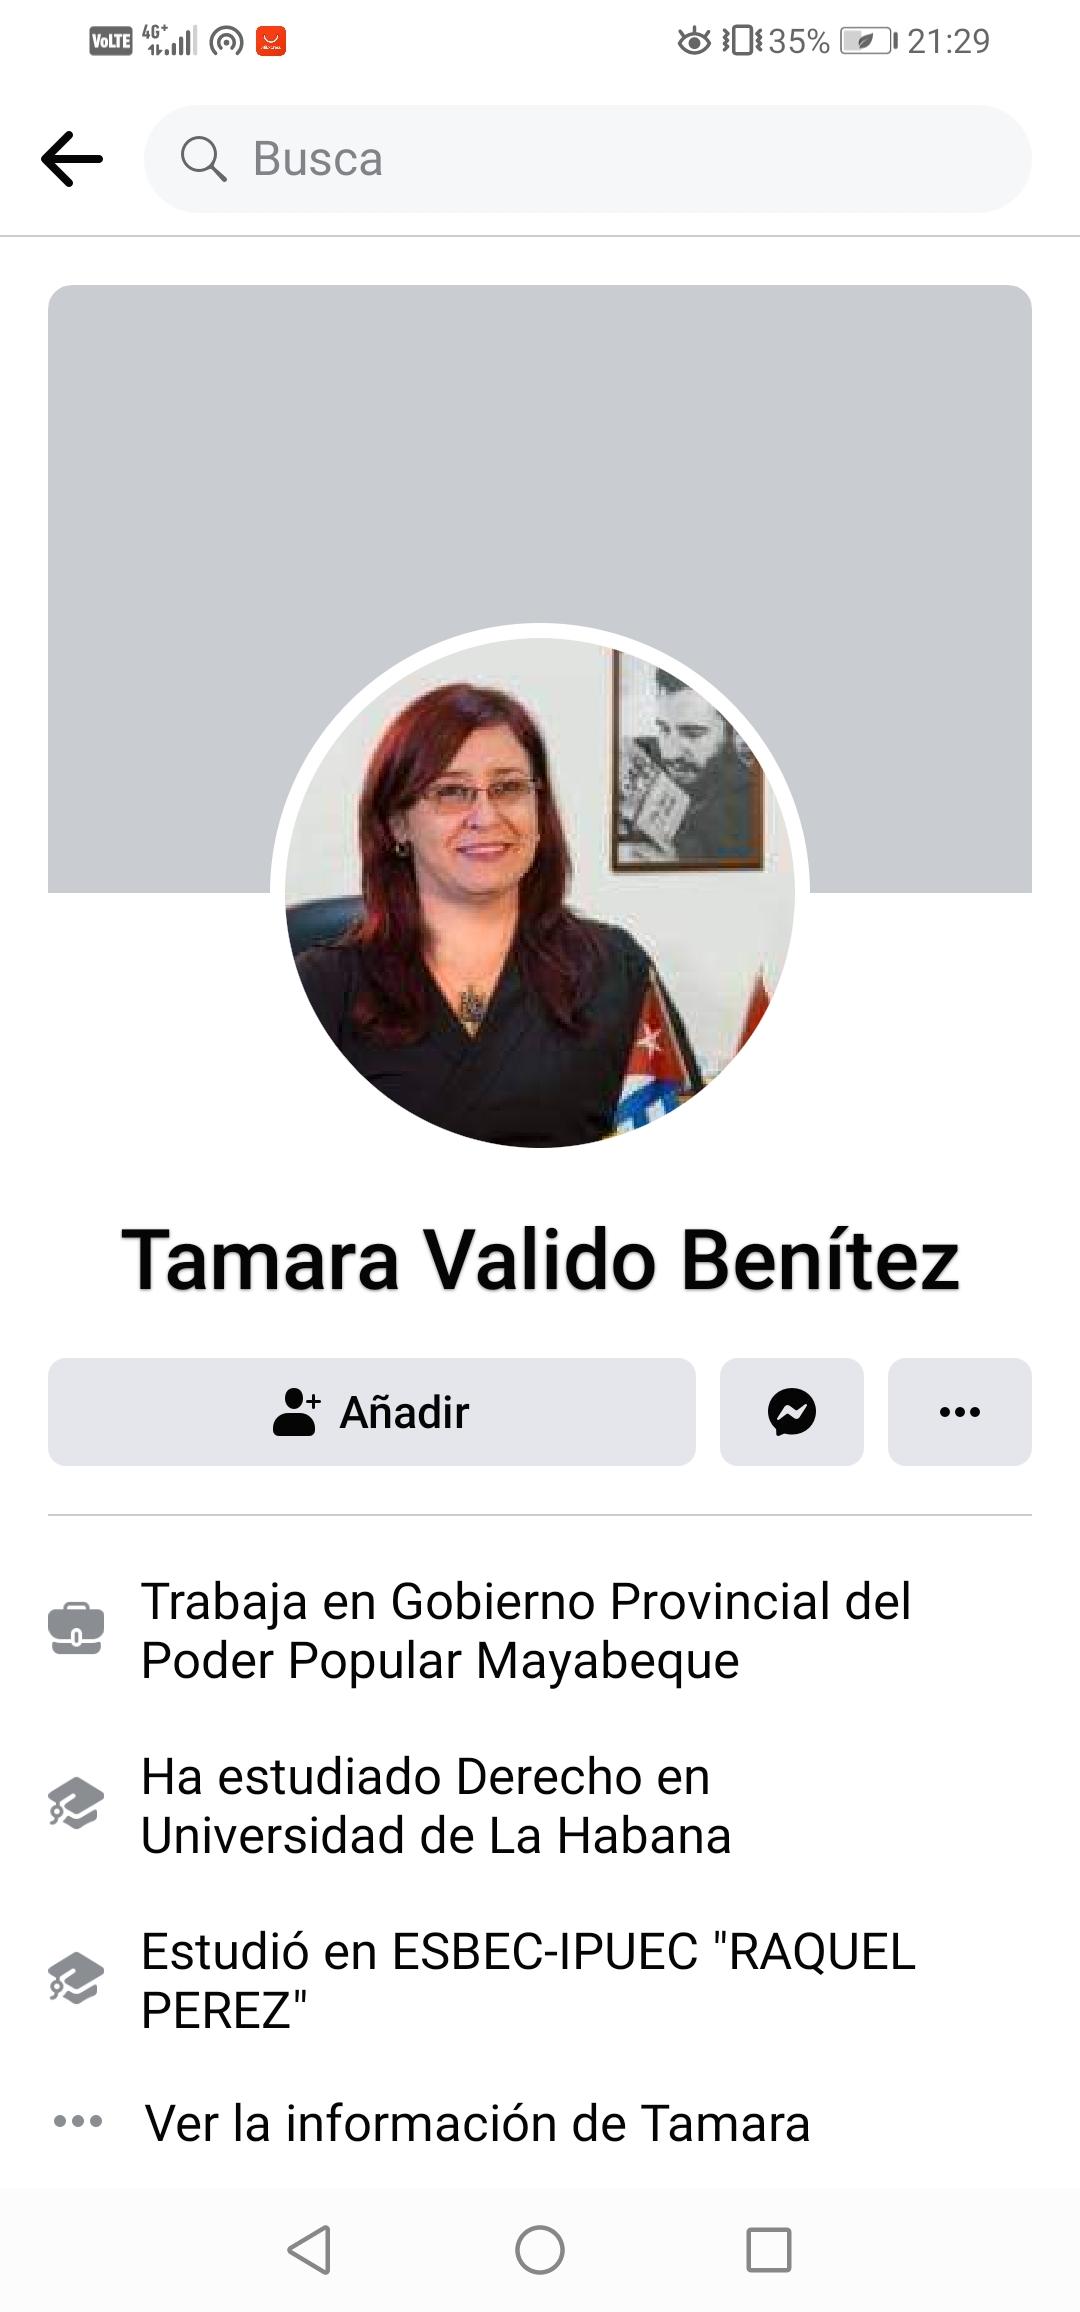 Tamara Valido Benítez